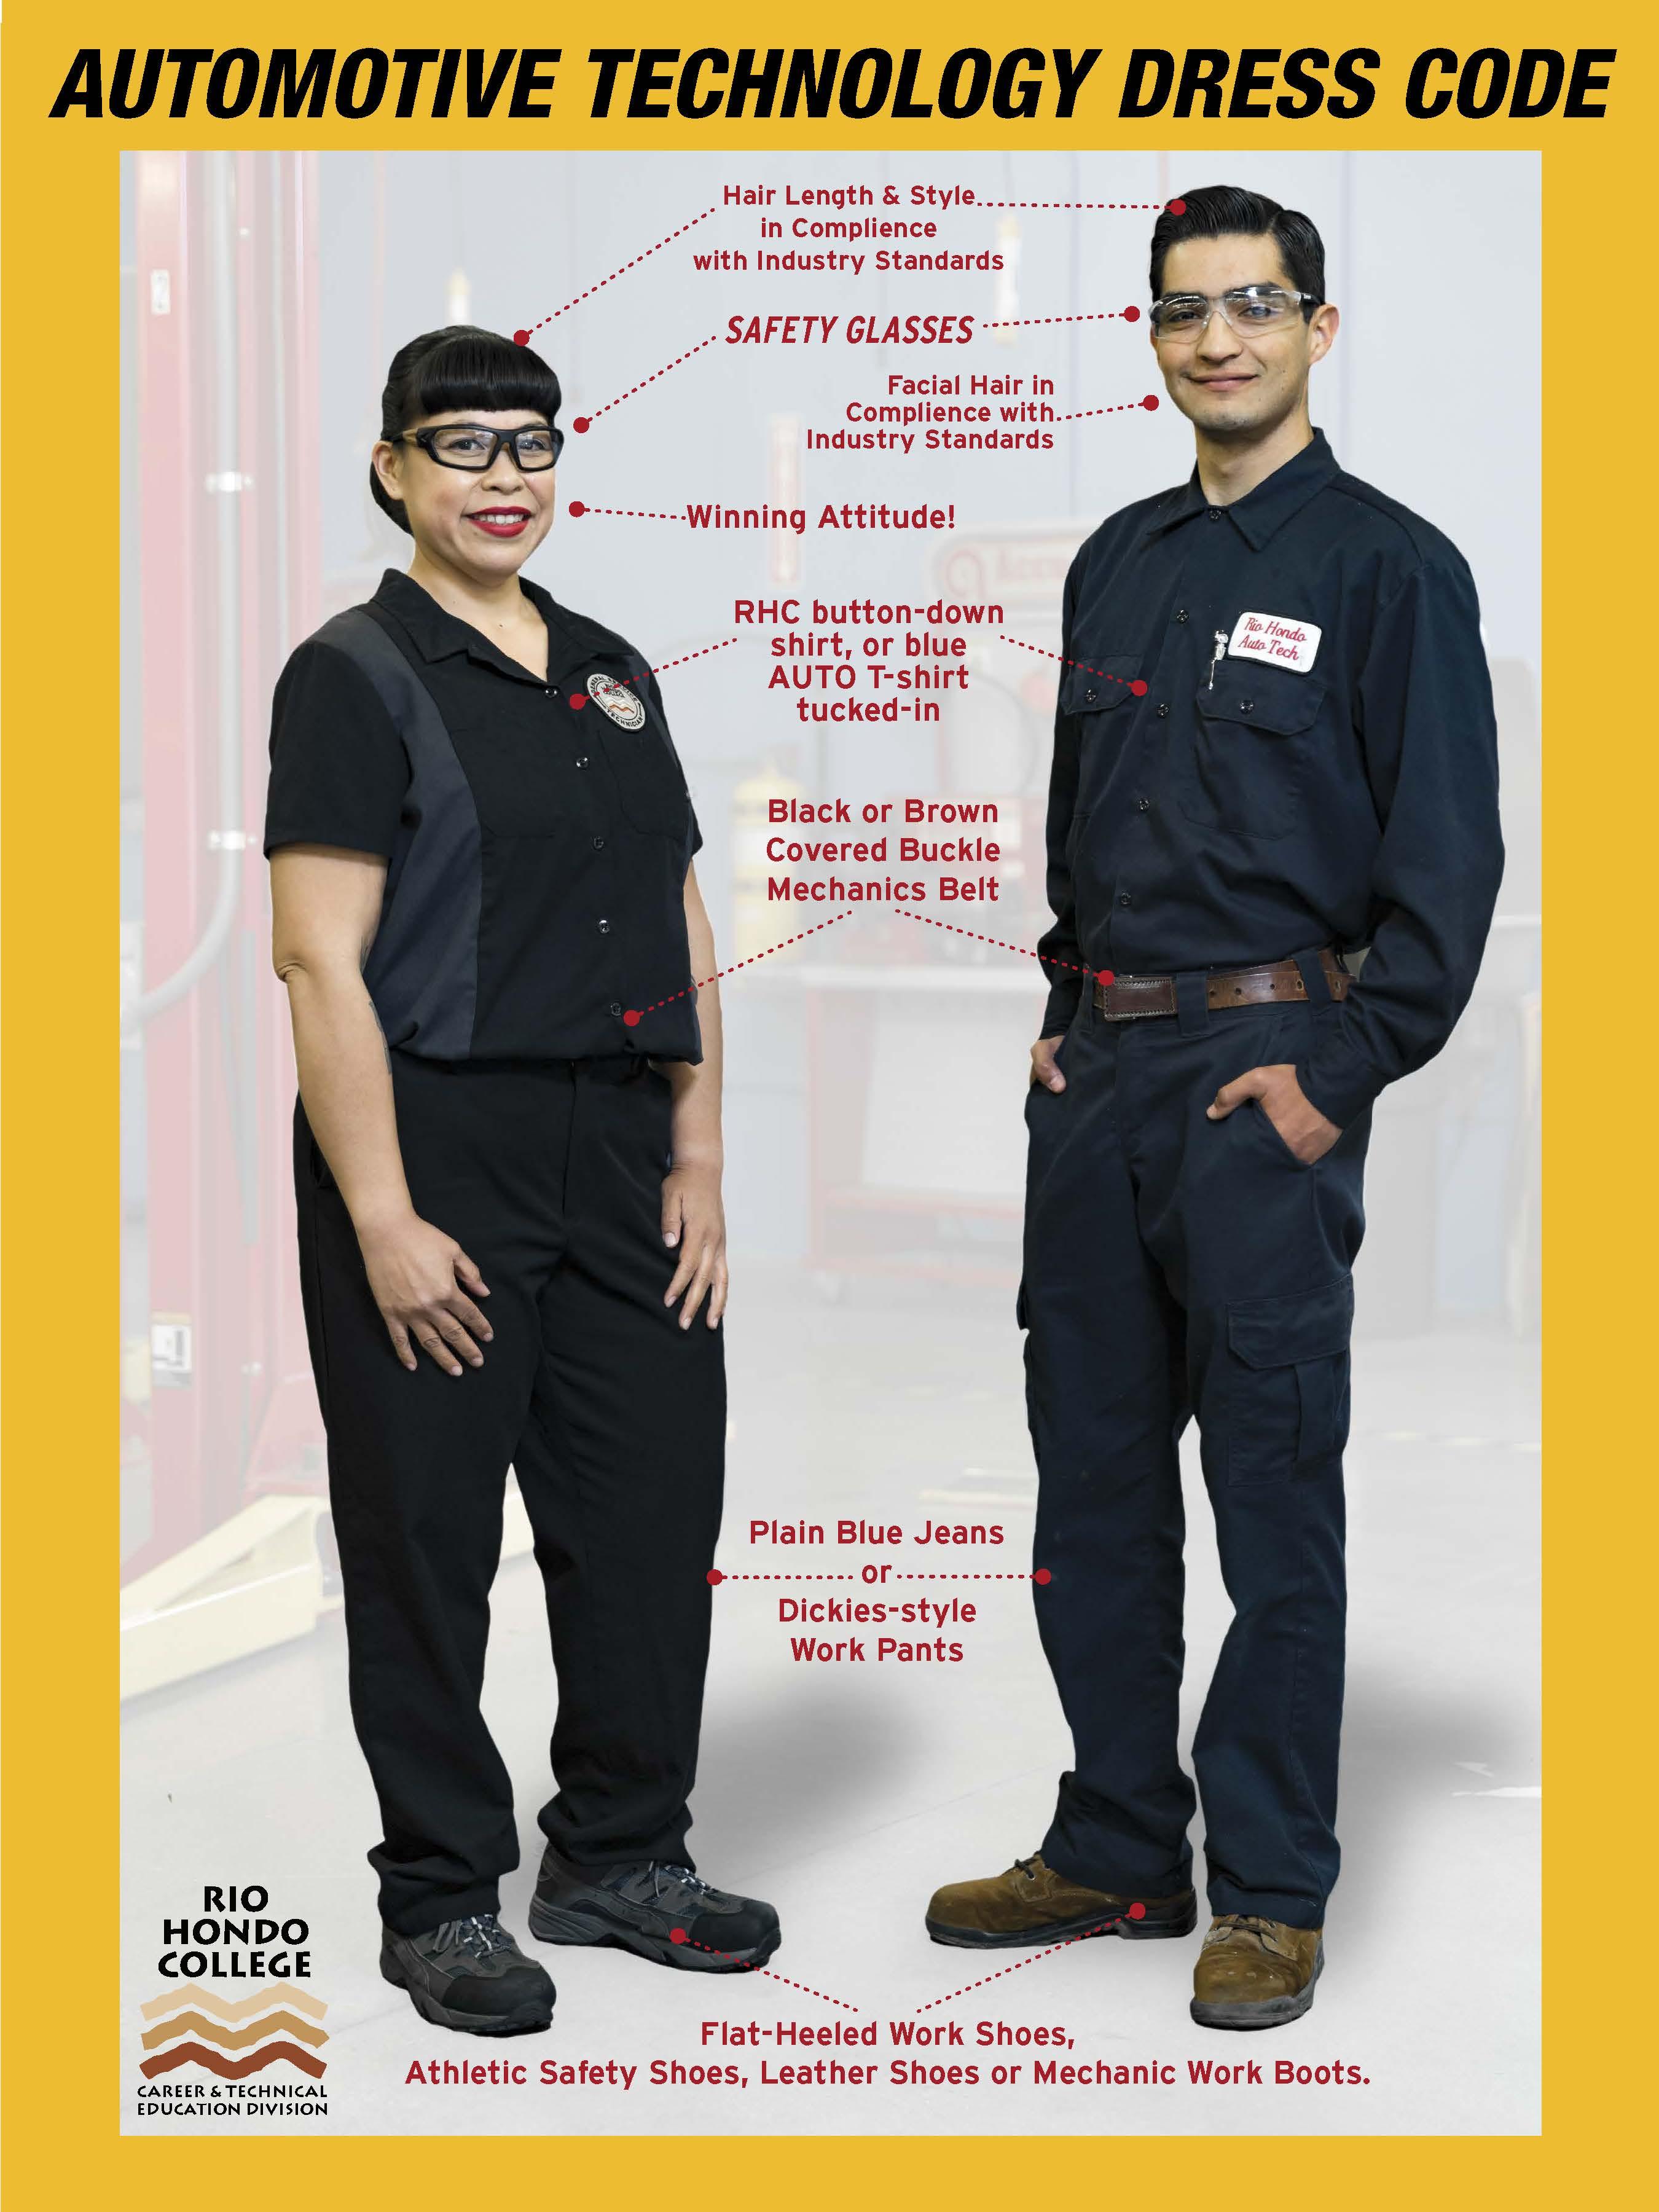 Automotive Technology Uniform Code Career And Technical